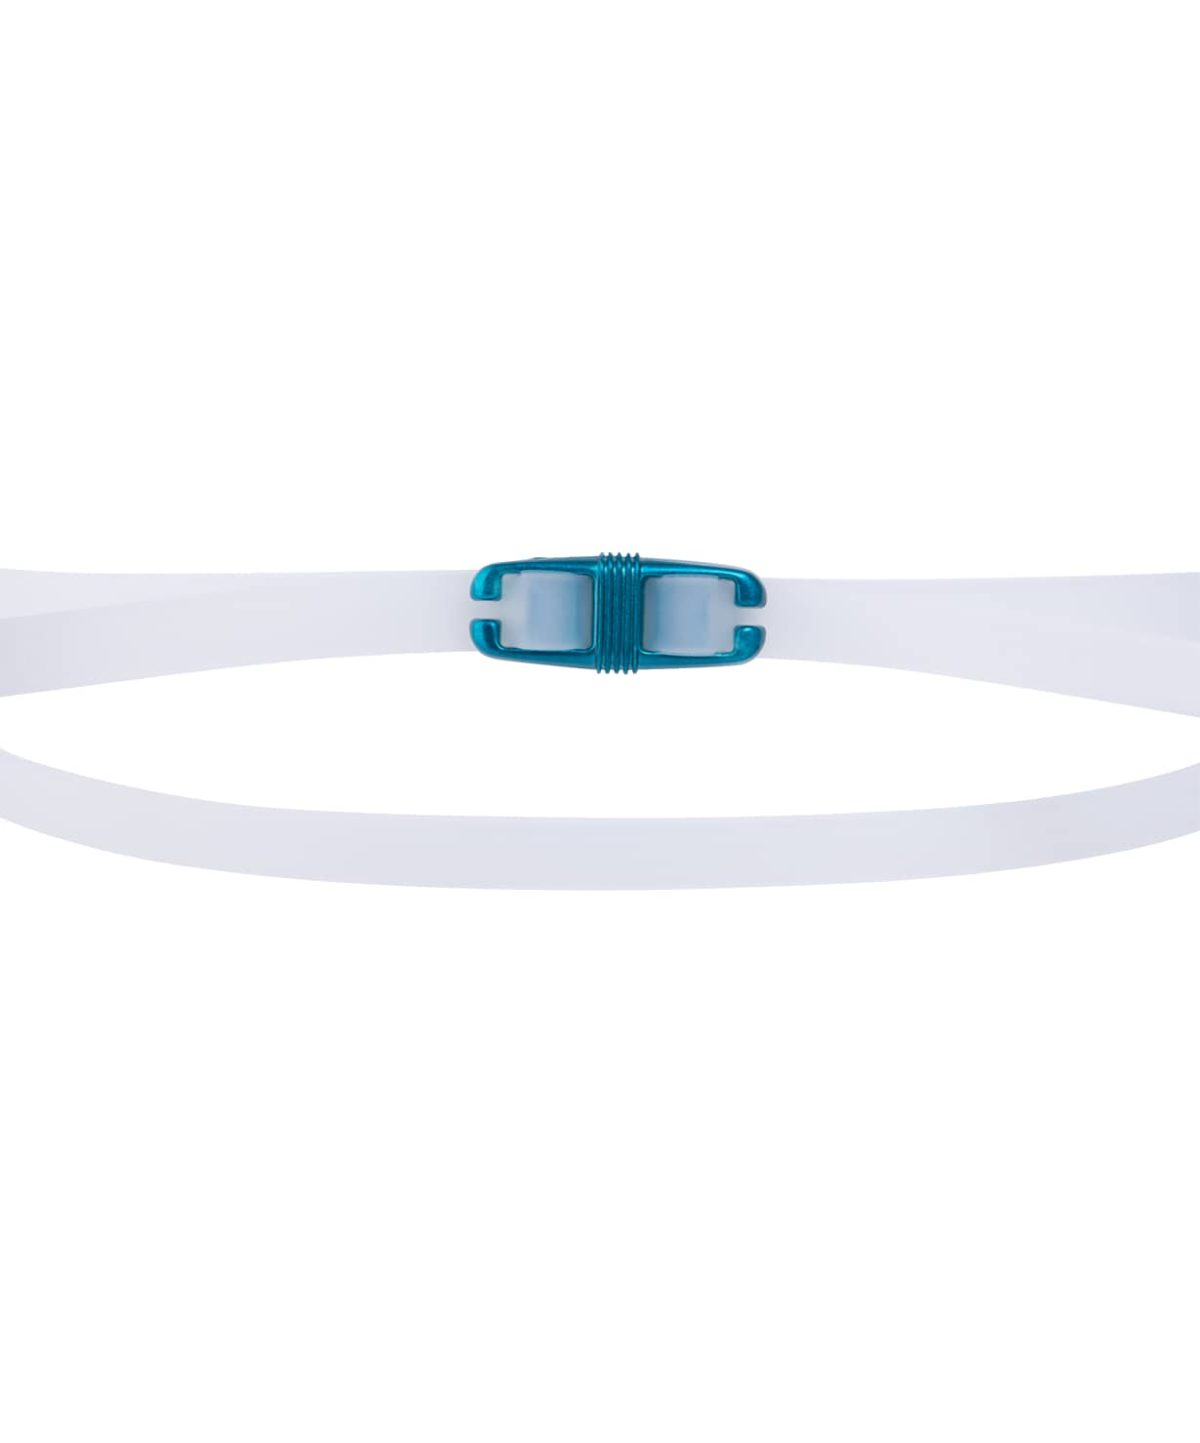 25DEGREES Pulso Mirrored White/Blue Очки для плавания  17355 - 3